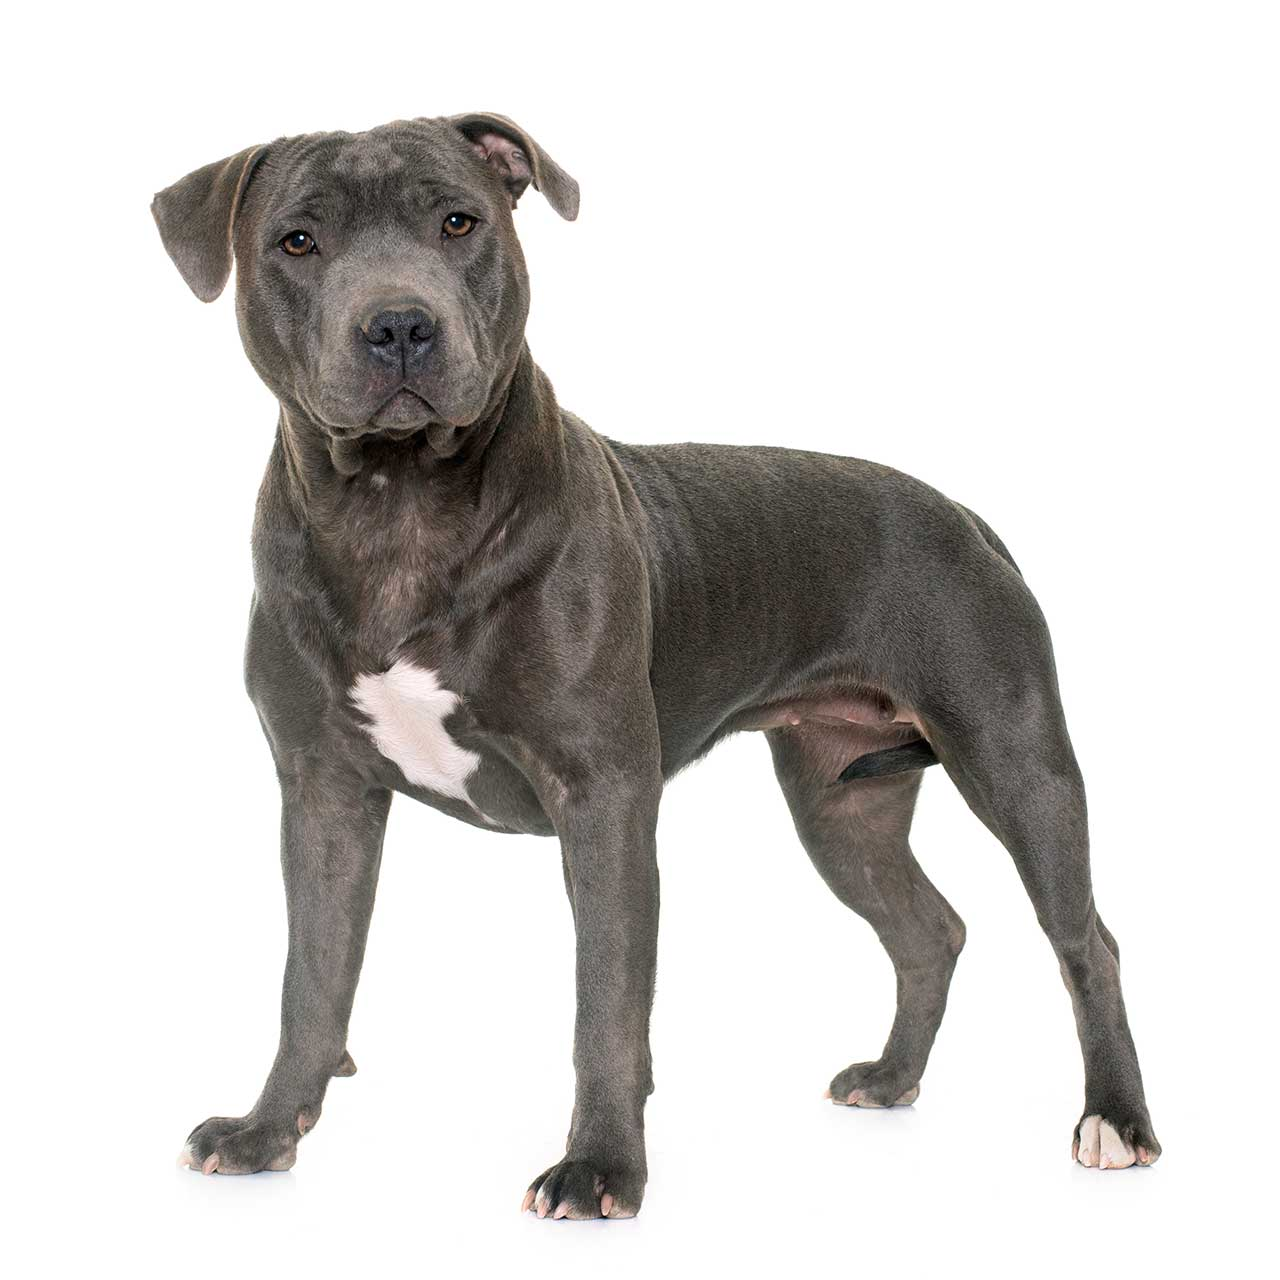 American Staffordshire Terrier vs Staffordshire Bull Terrier